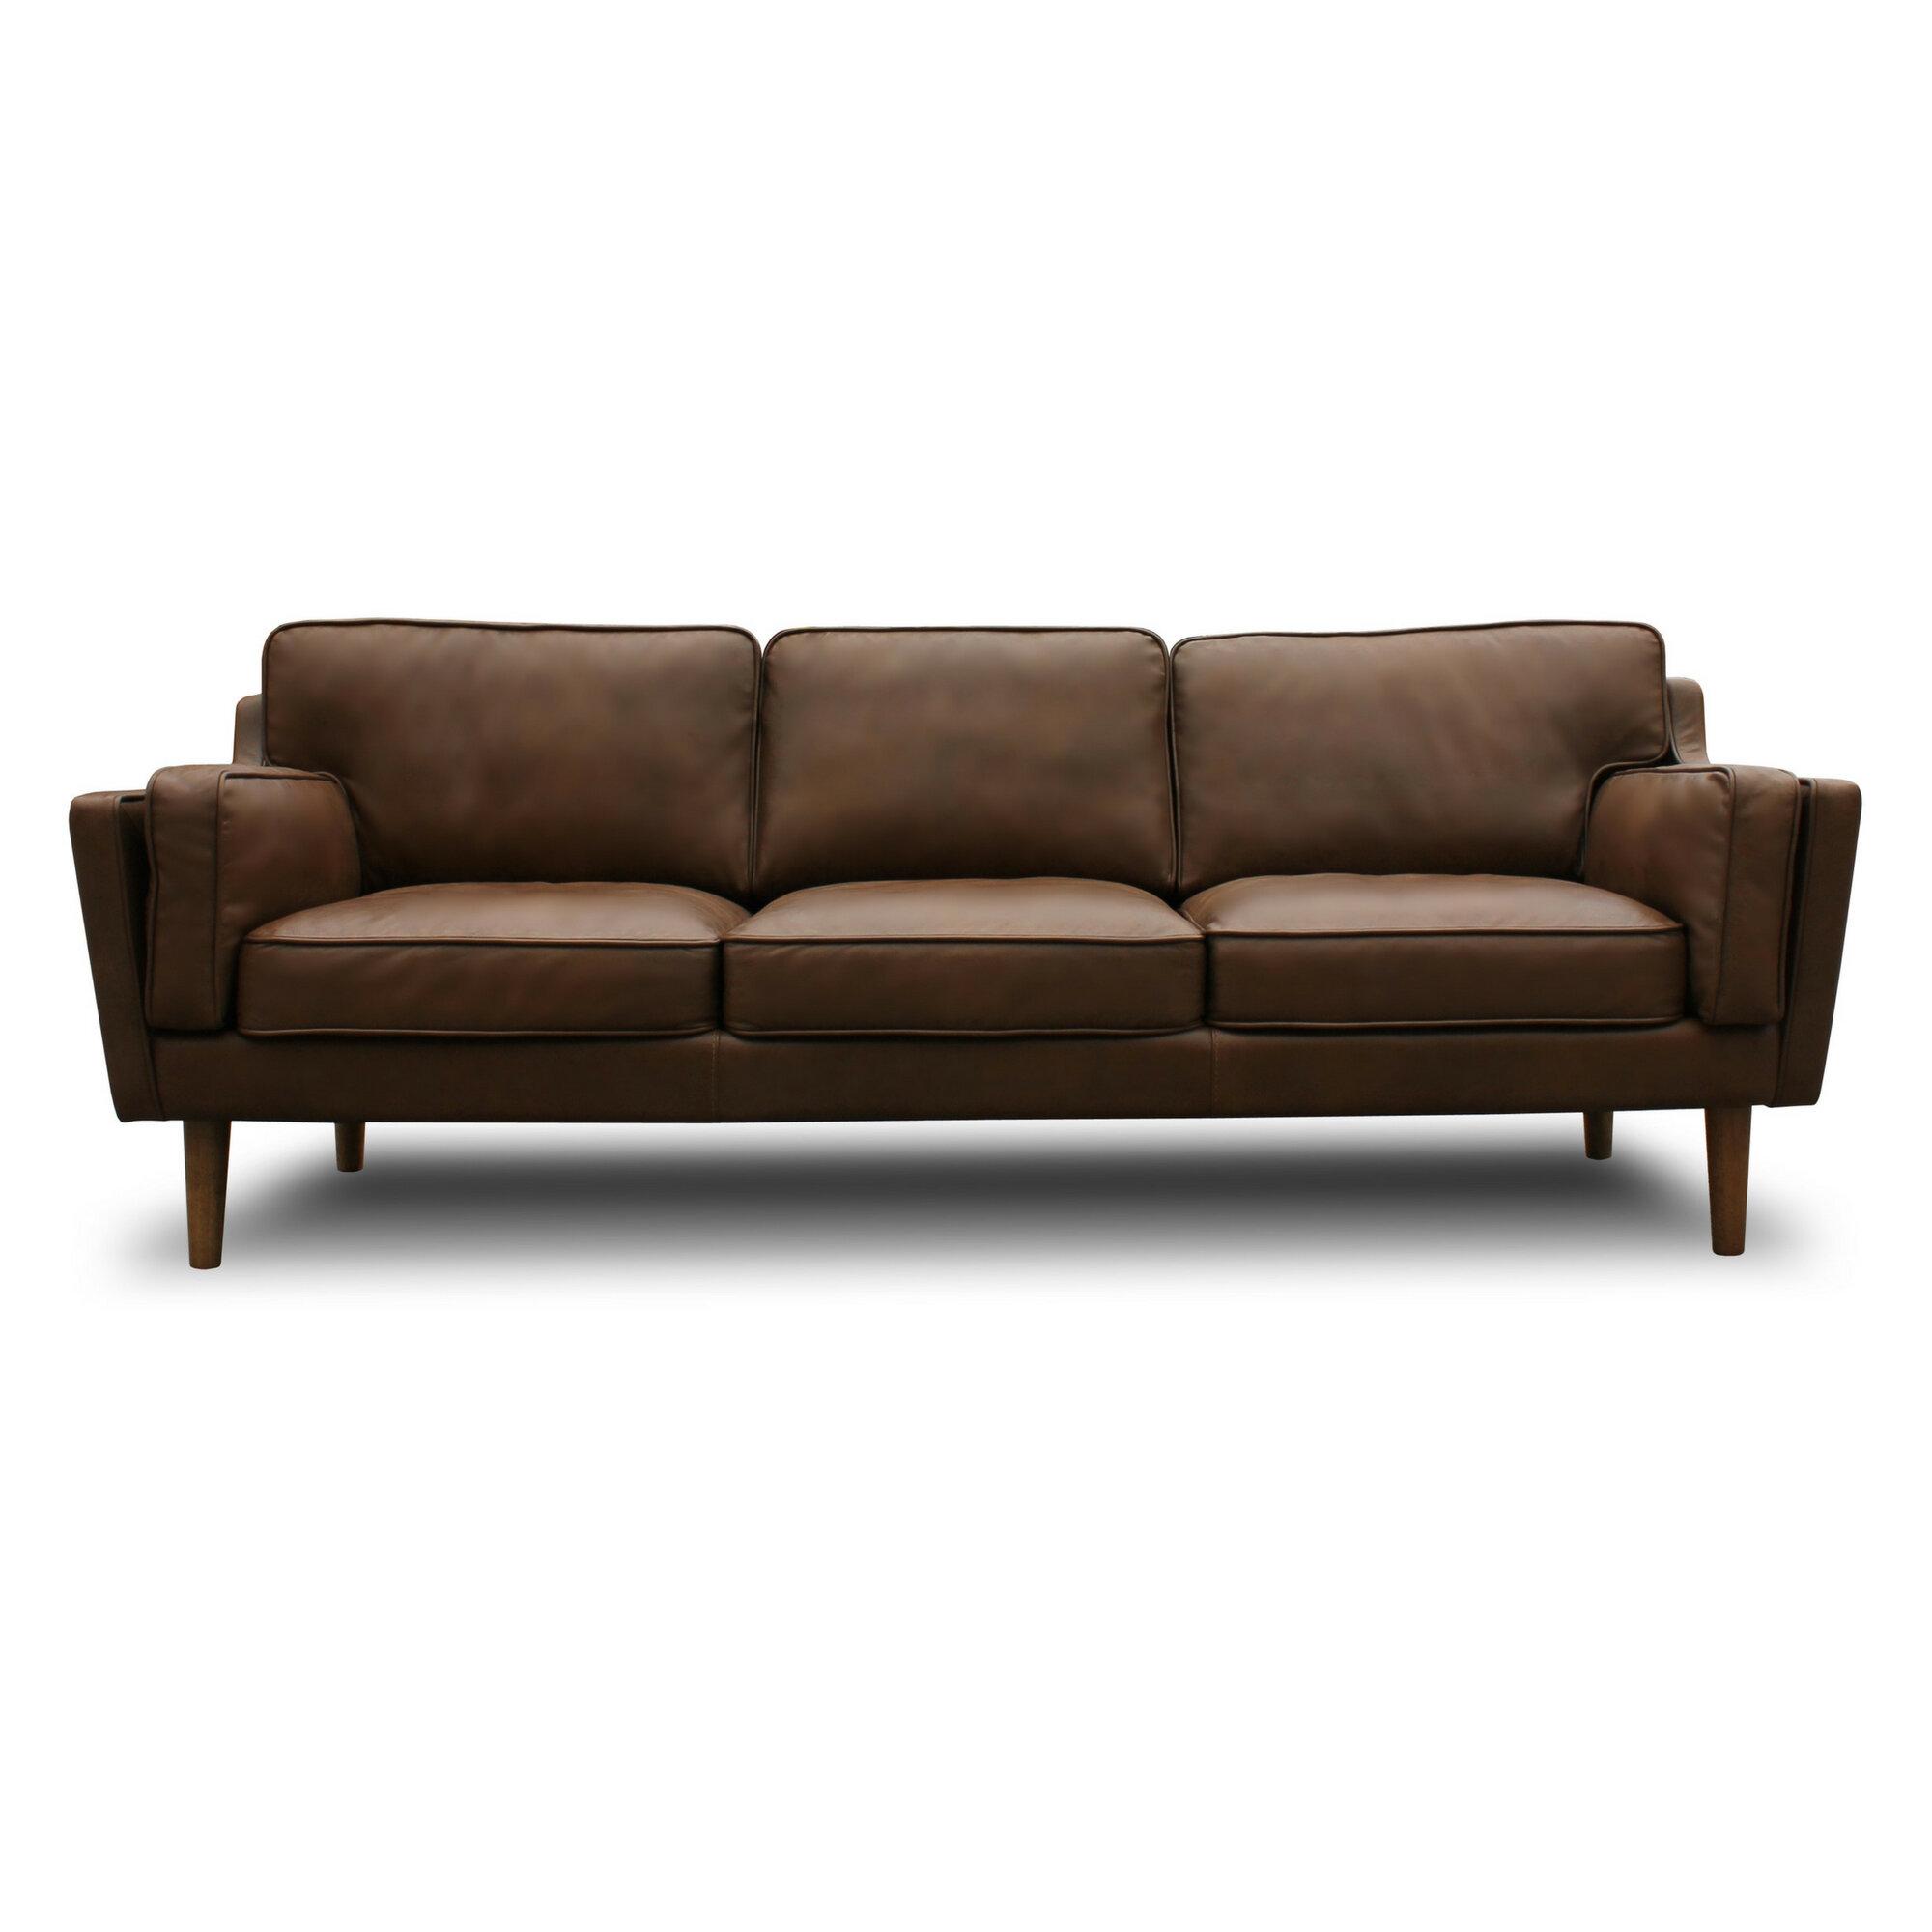 Union Rustic Kaufman Mid Century Modern Leather Sofa & Reviews | Wayfair